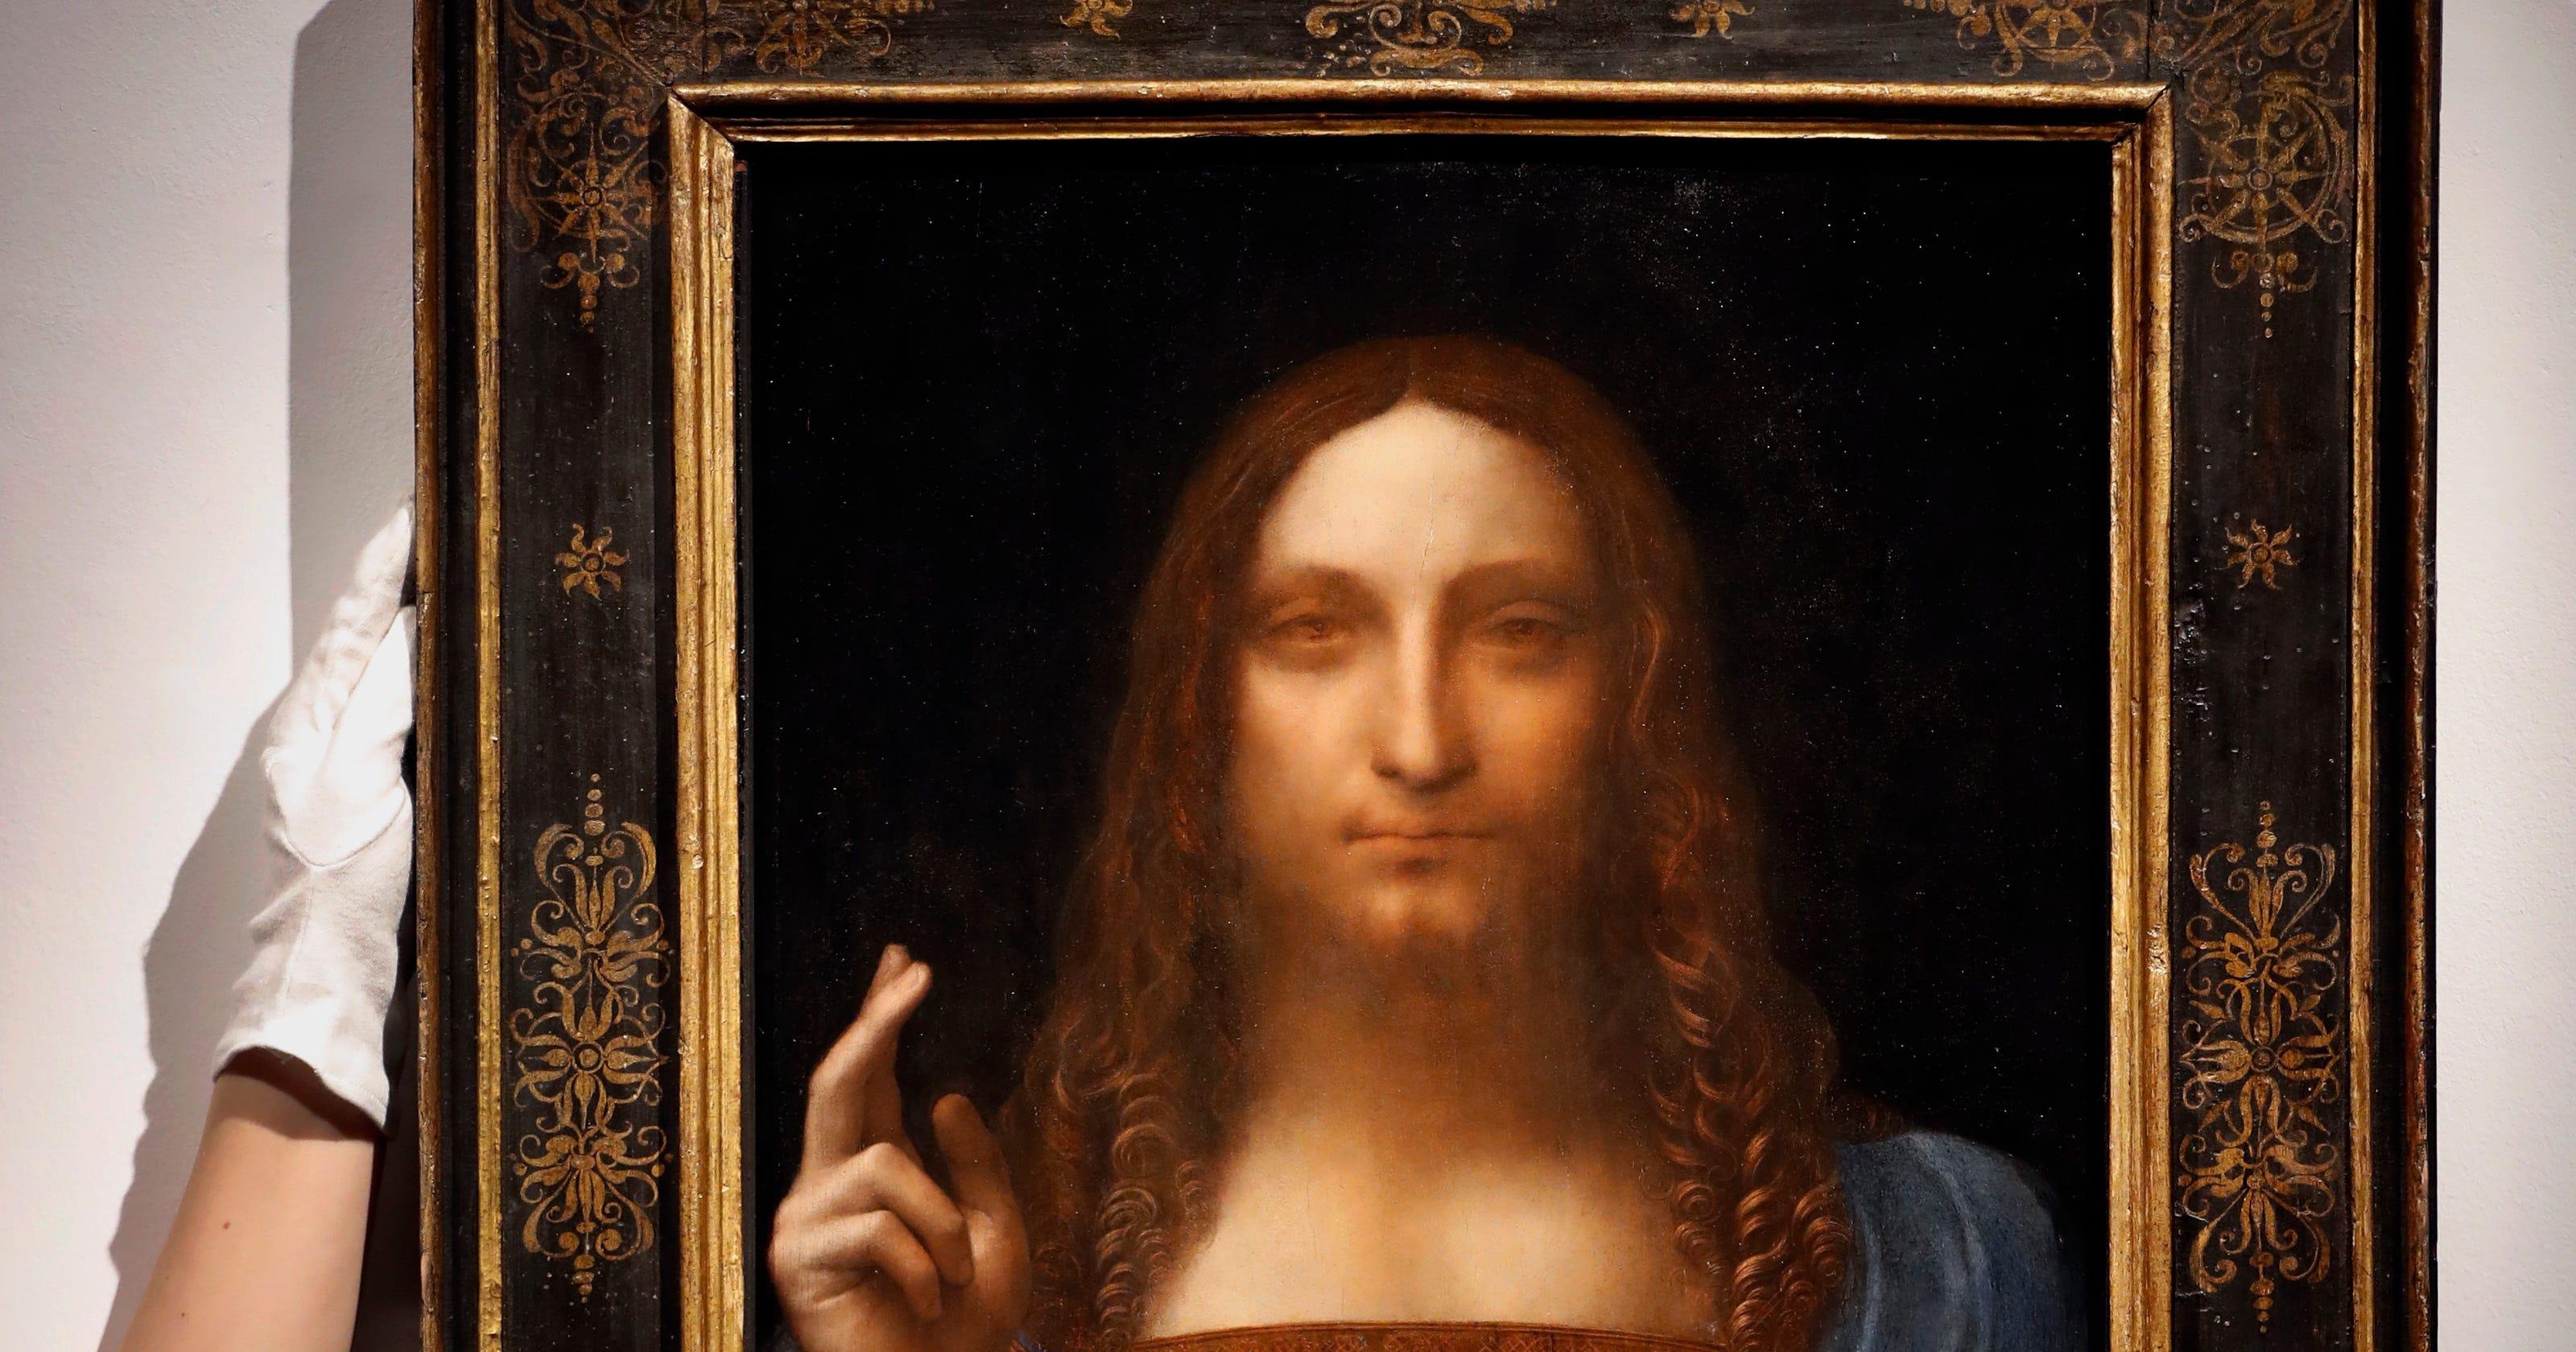 Leonardo Da Vinci's $450 million painting headed to Louvre ...